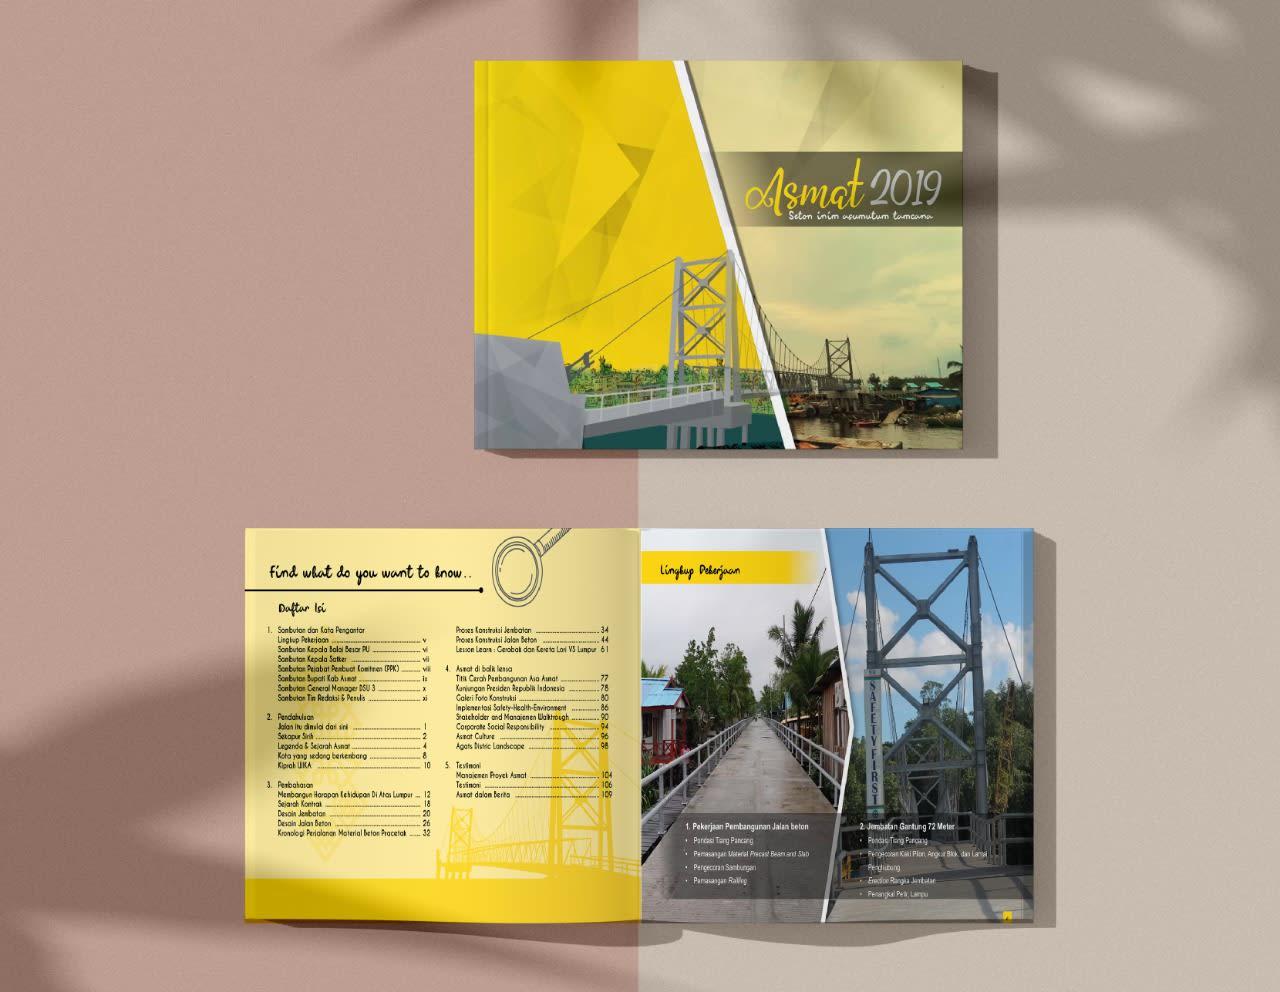 portfolio popout.id web development agency jakarta client Profil Proyek Asmat WIKA